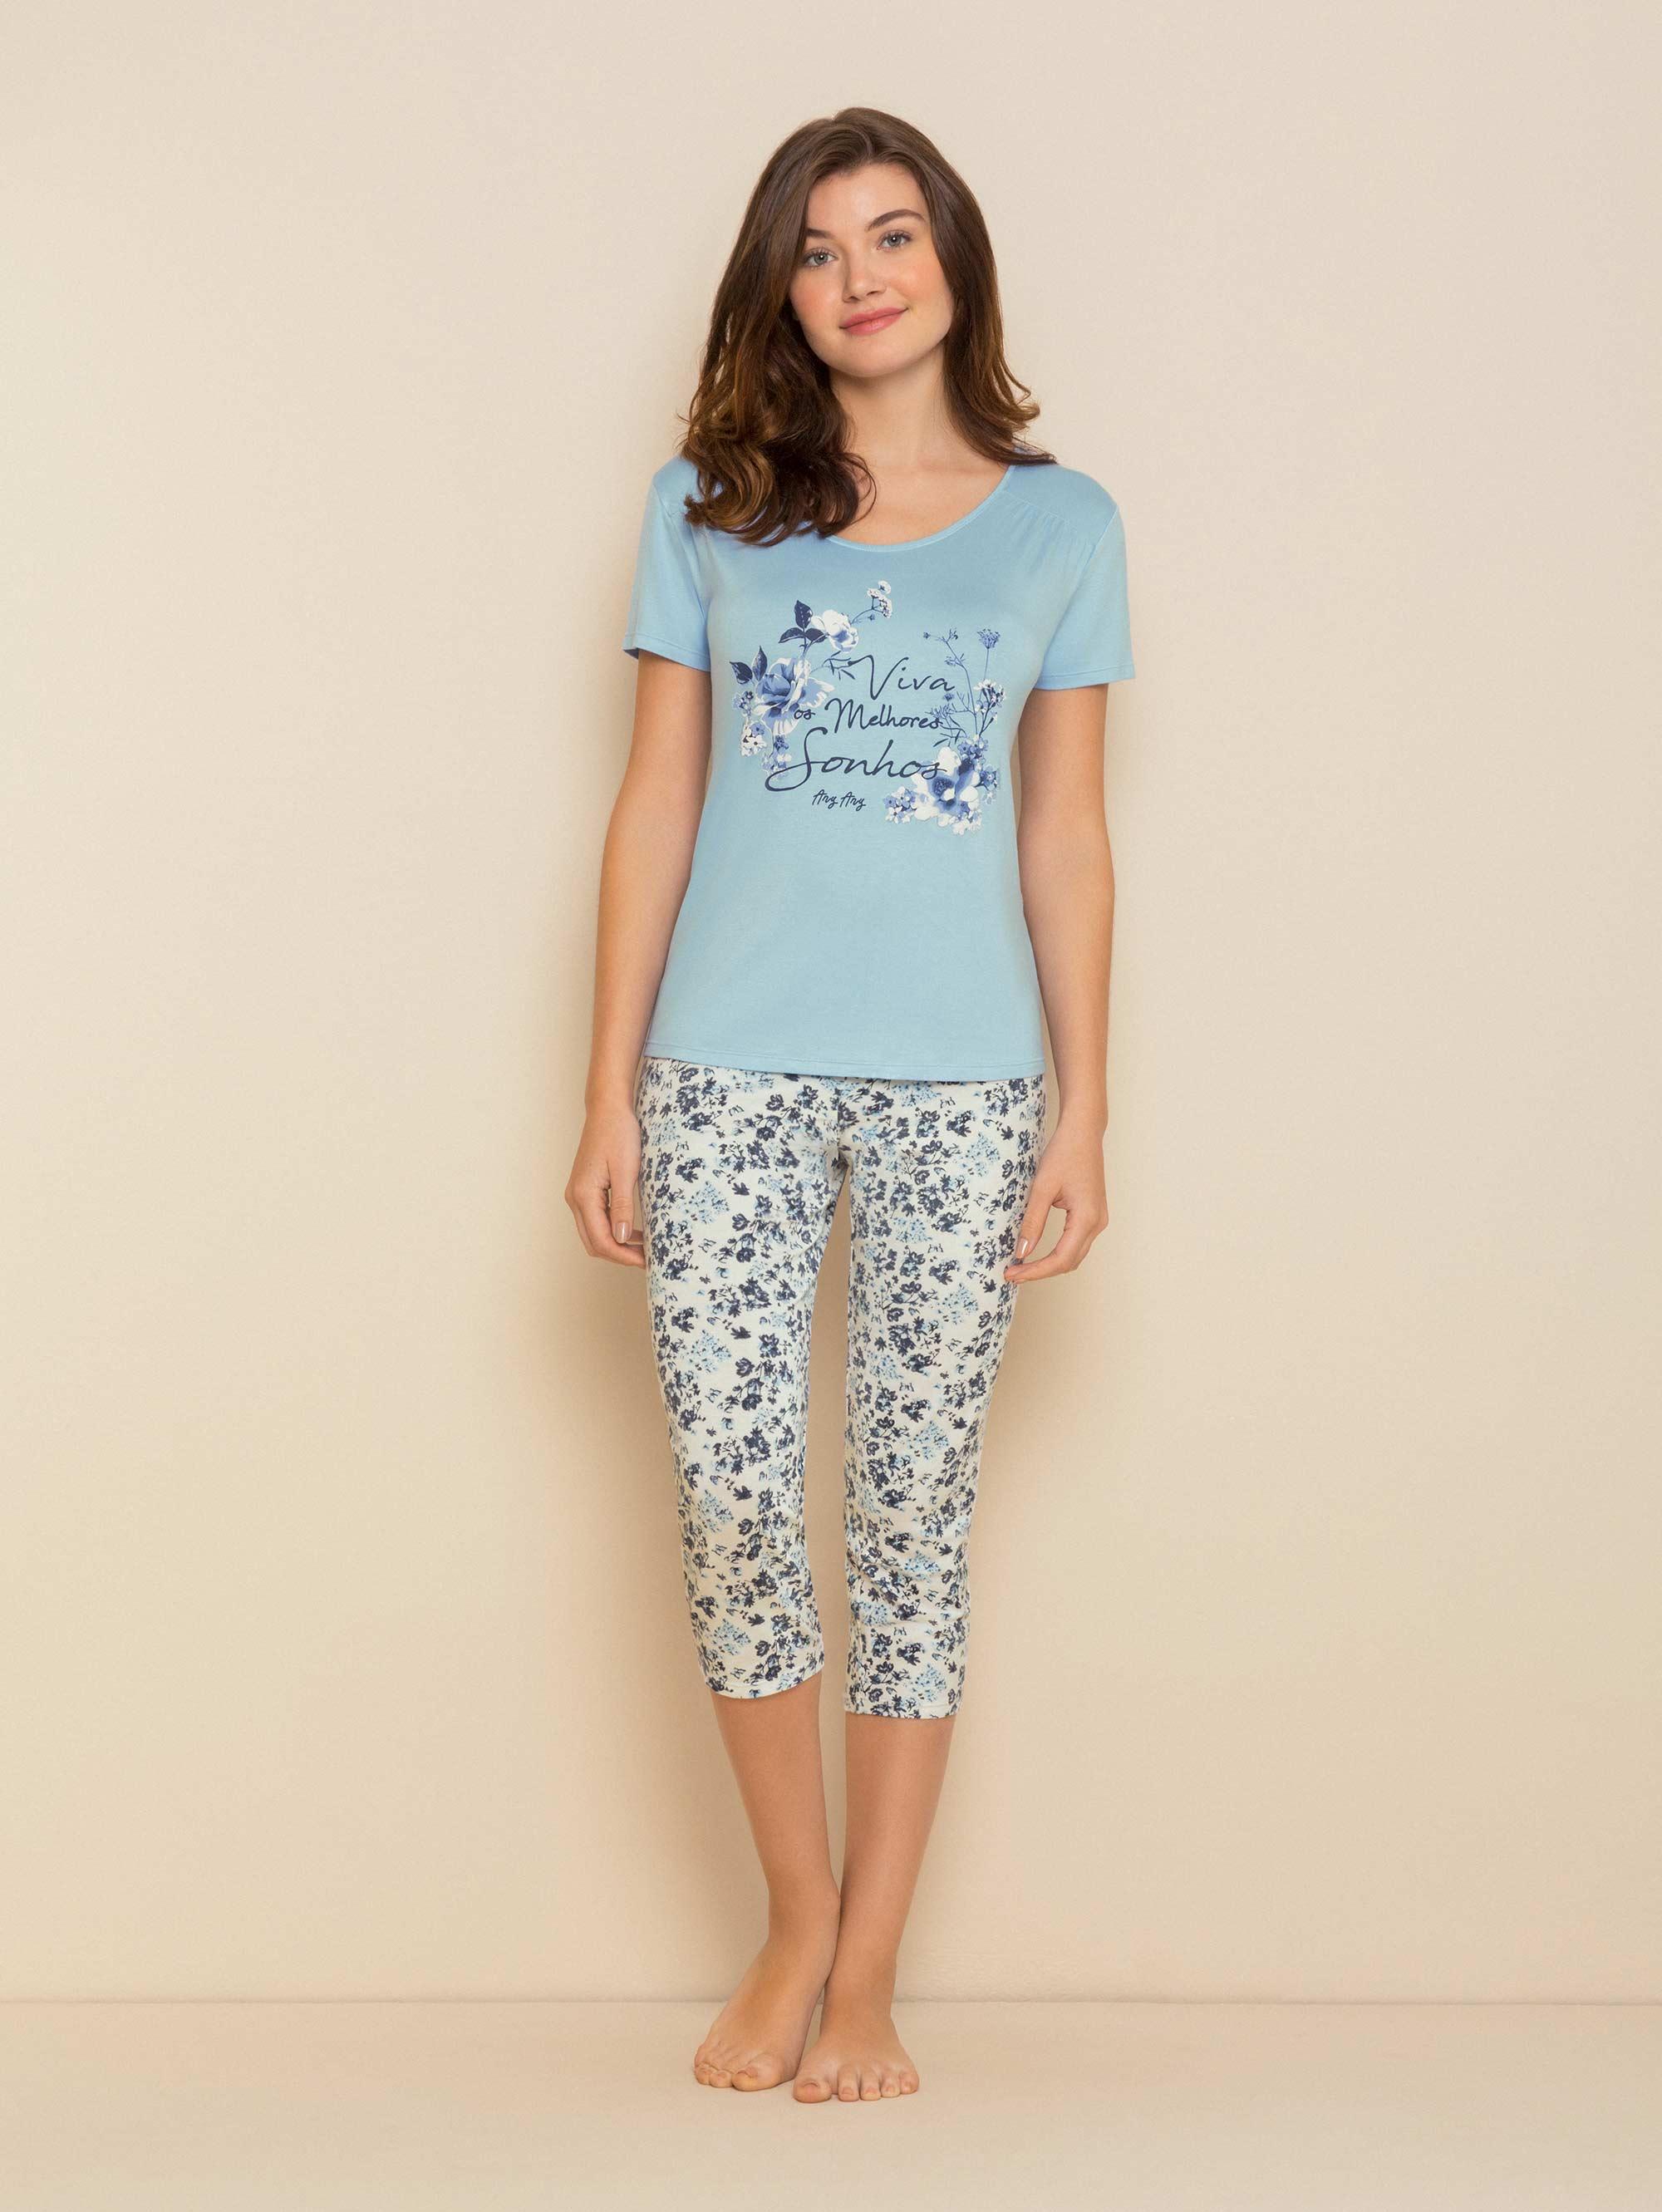 Pijama-Feminino-Capri-Manga-Curta-Viva-o-Sonho-04.03.0601